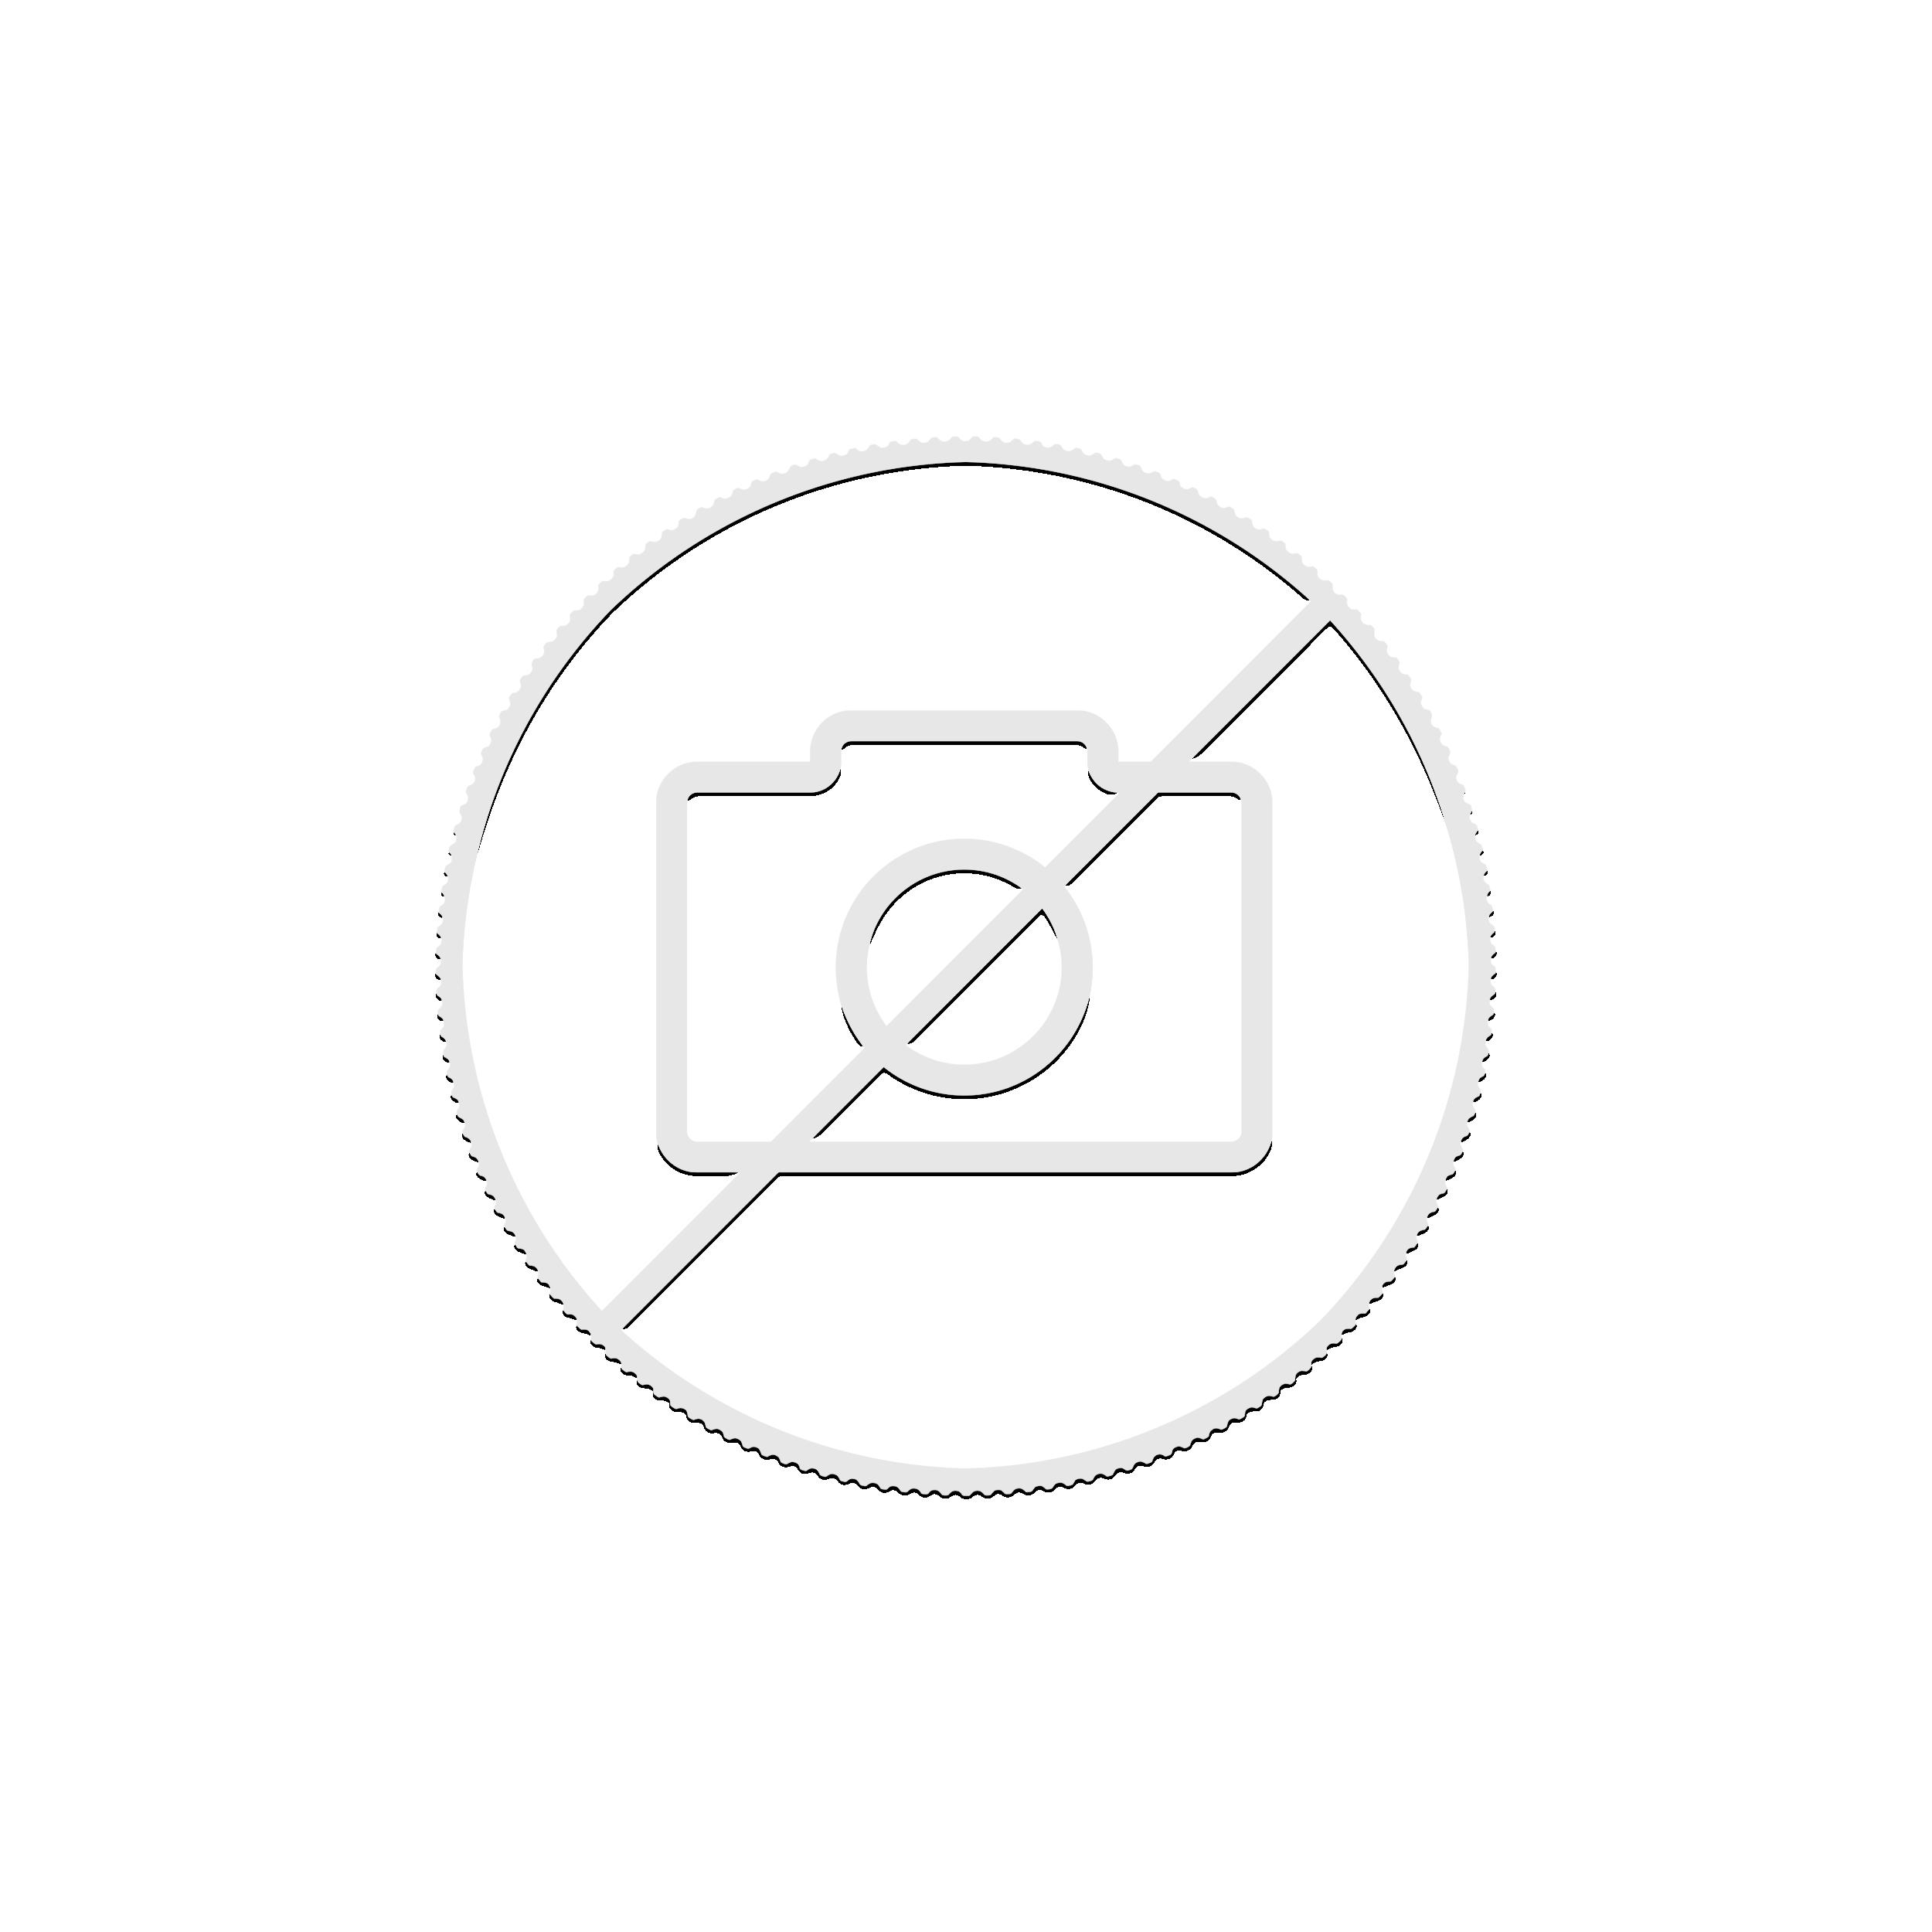 2 troy ounce zilveren munt Rose Trellis Egg 2021 Proof